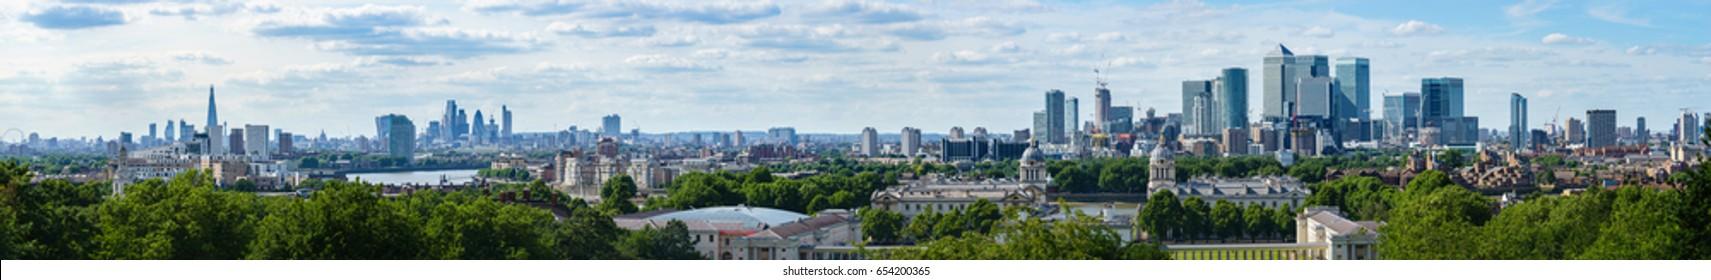 London skyline panorama of modern skyscrapers